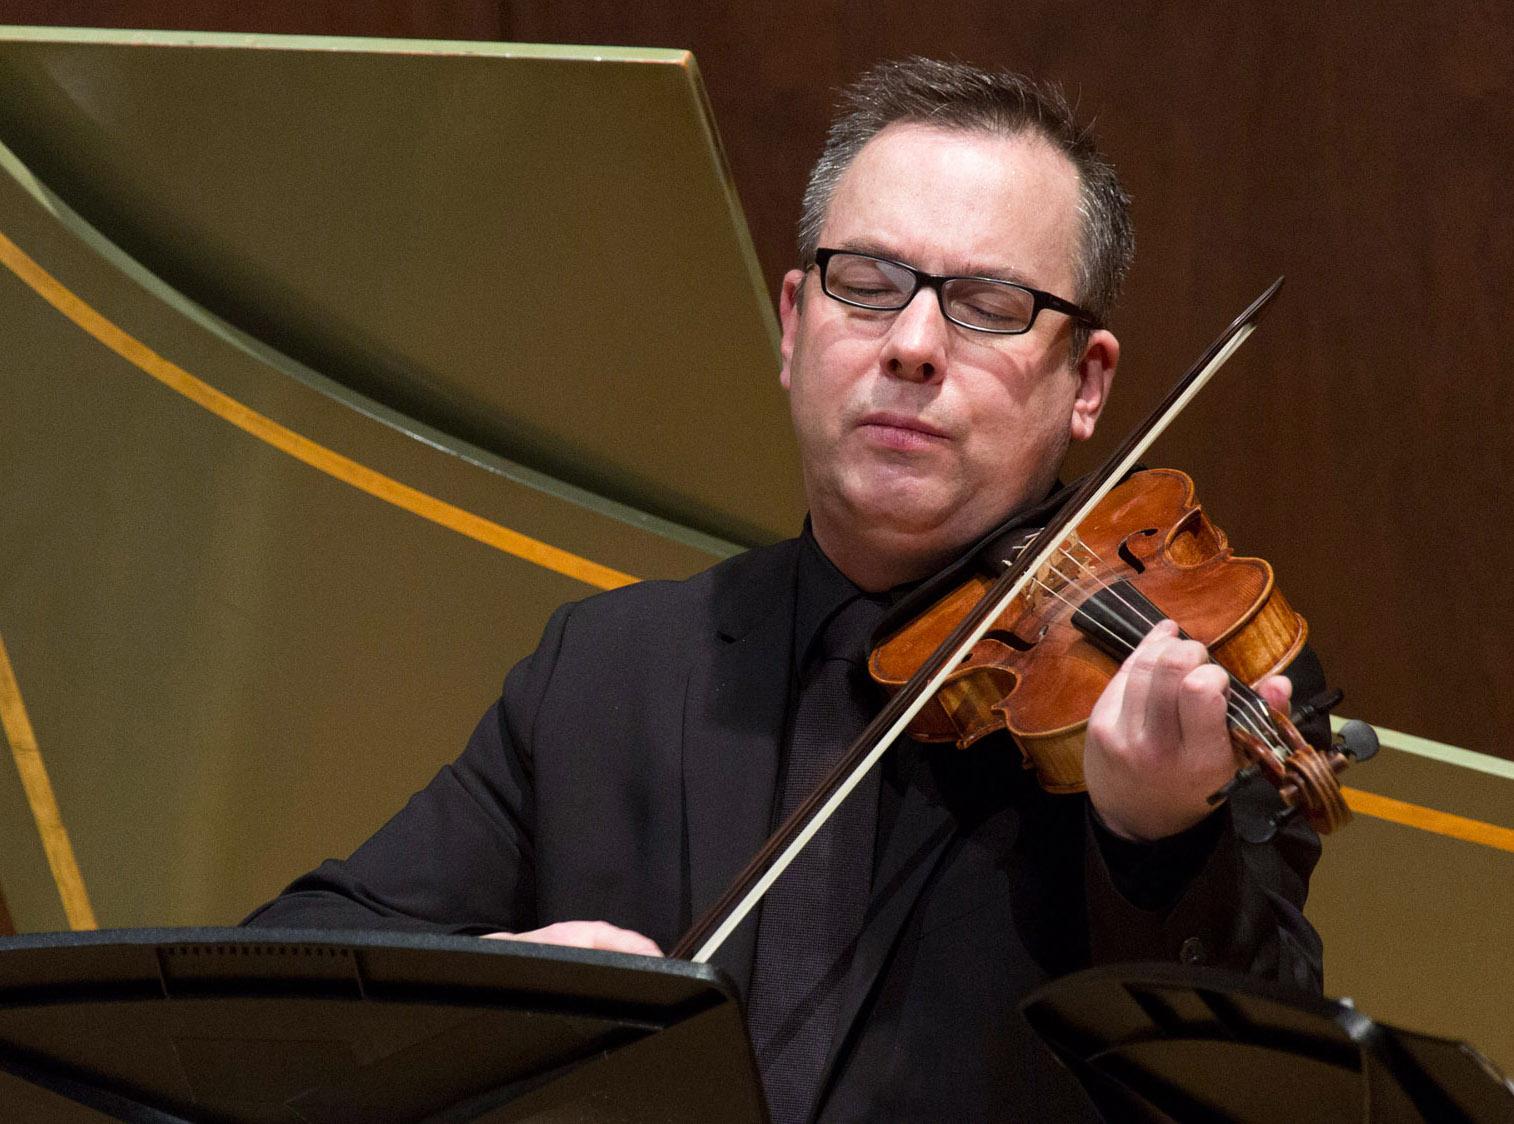 Robert Mealy Juilliard415